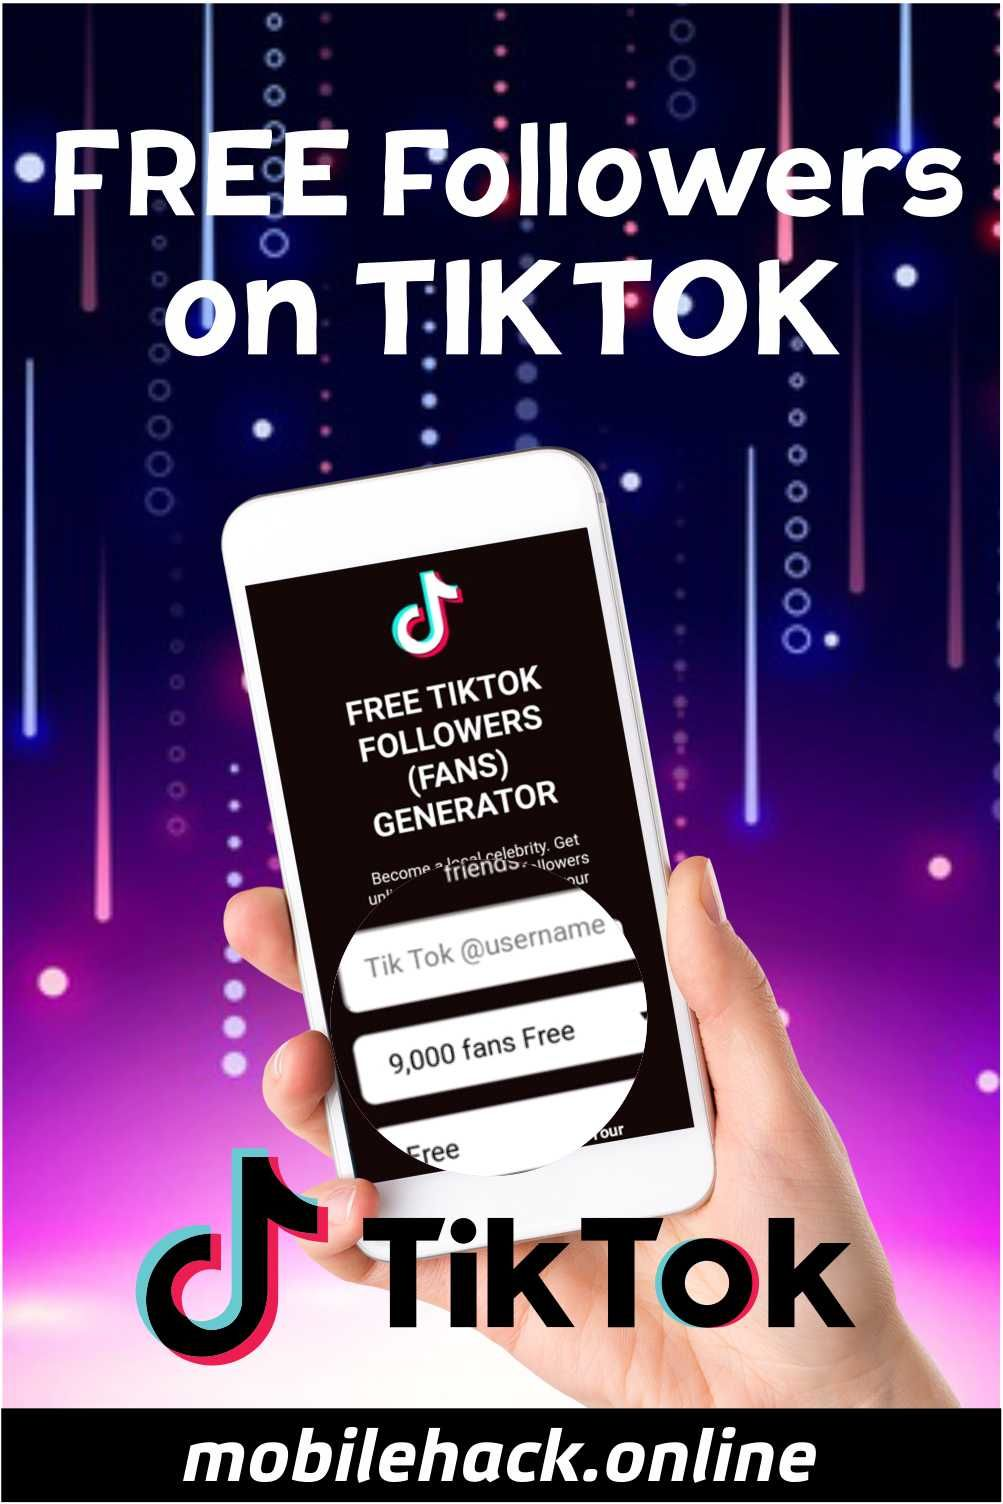 Free Tiktok Followers Free Followers How To Get Followers Auto Follower